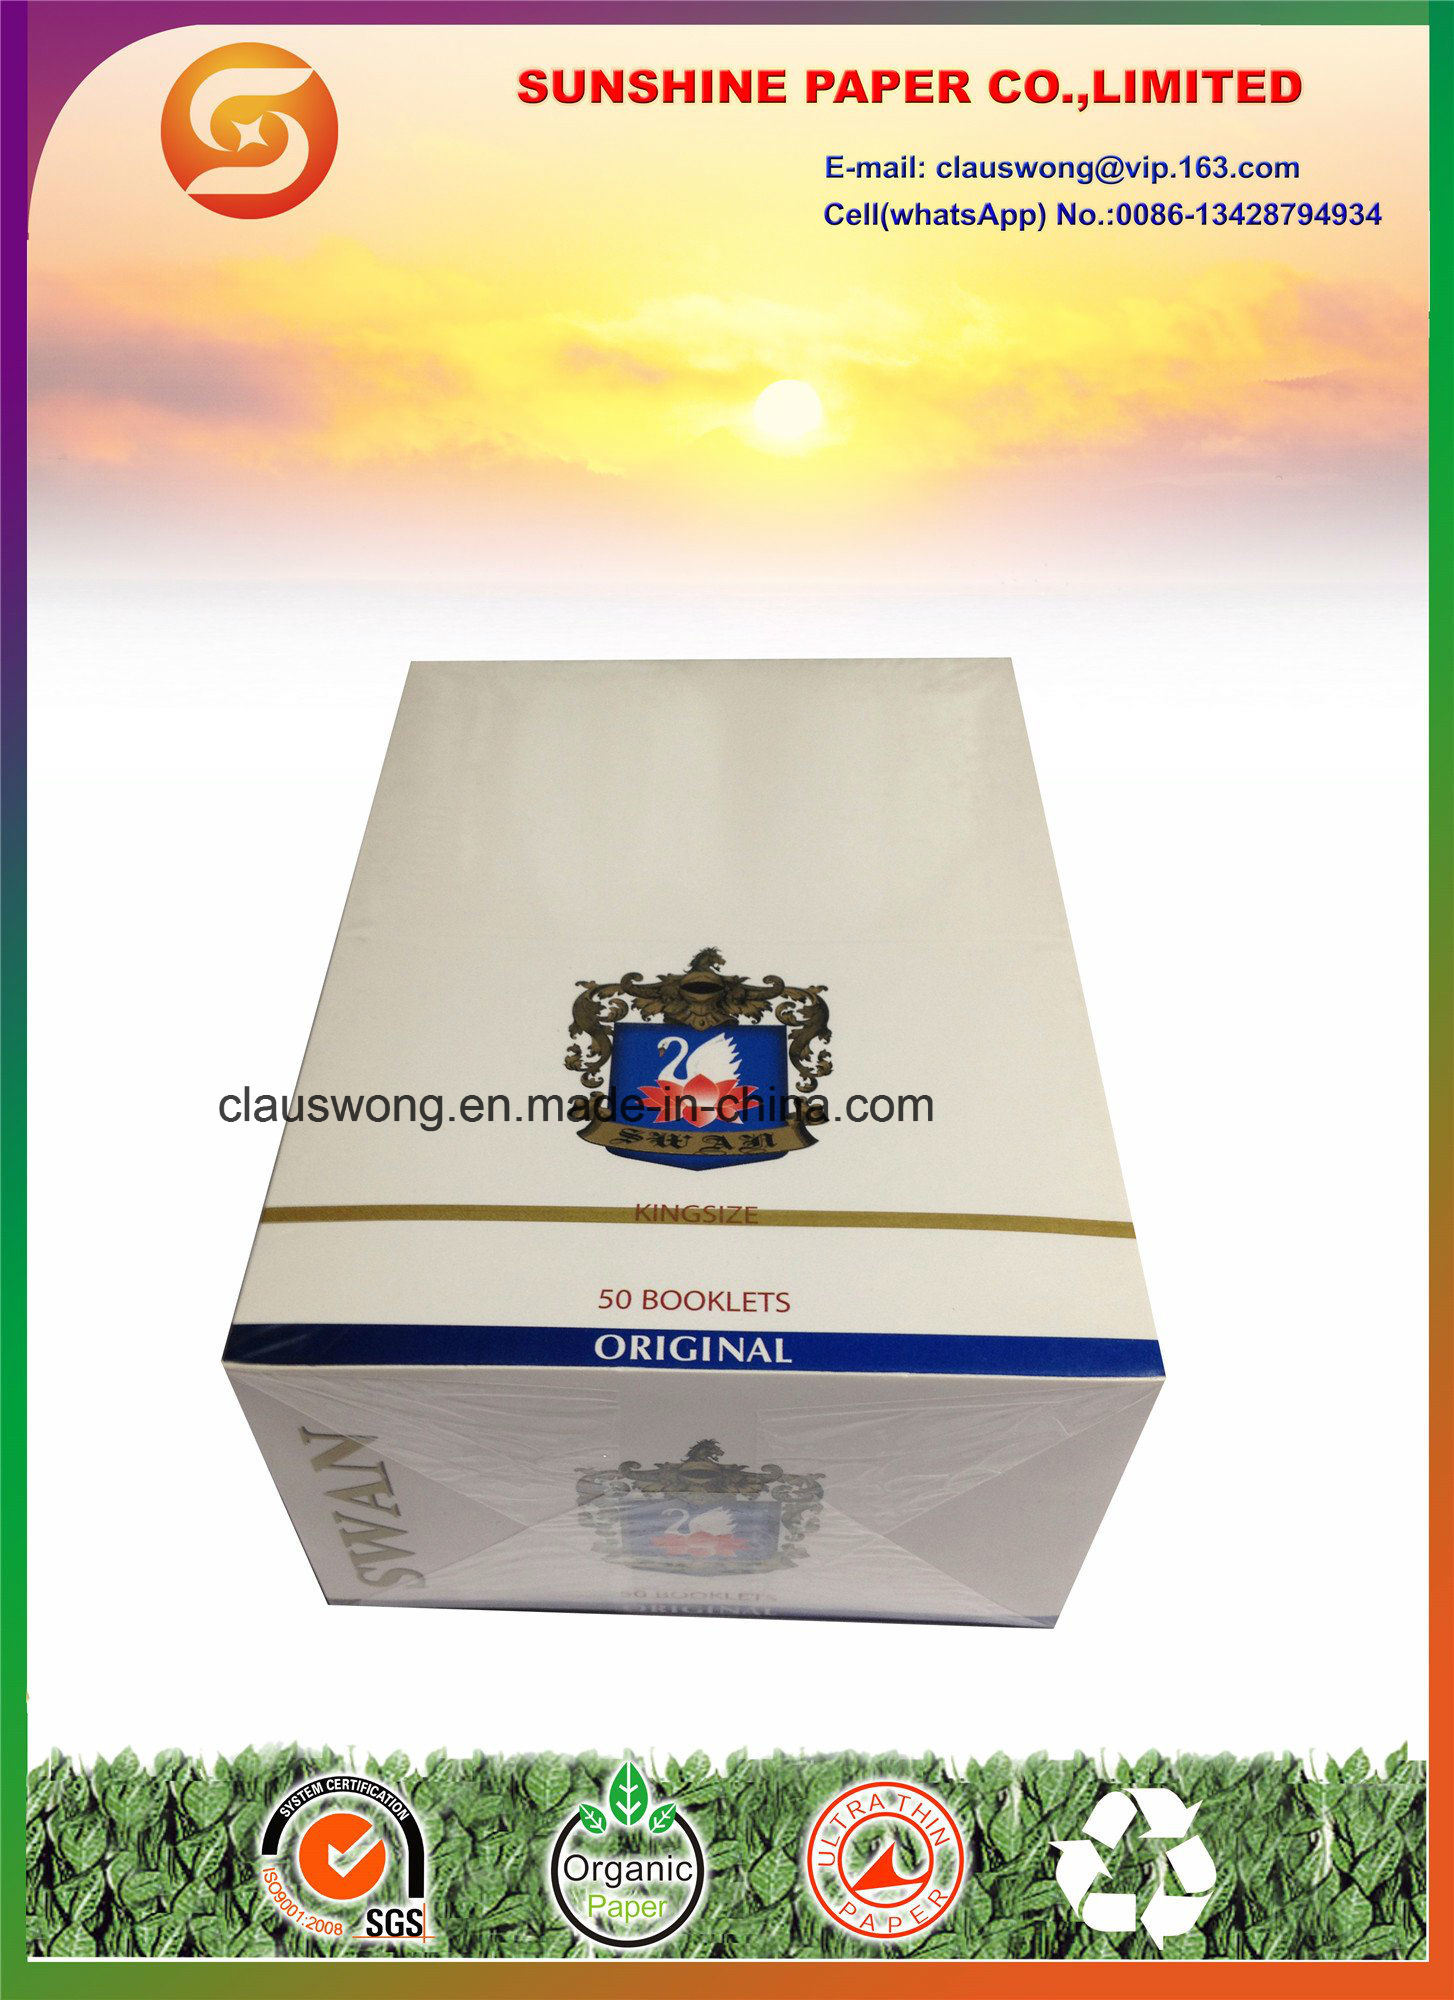 King Size Swan Cigarette Paper